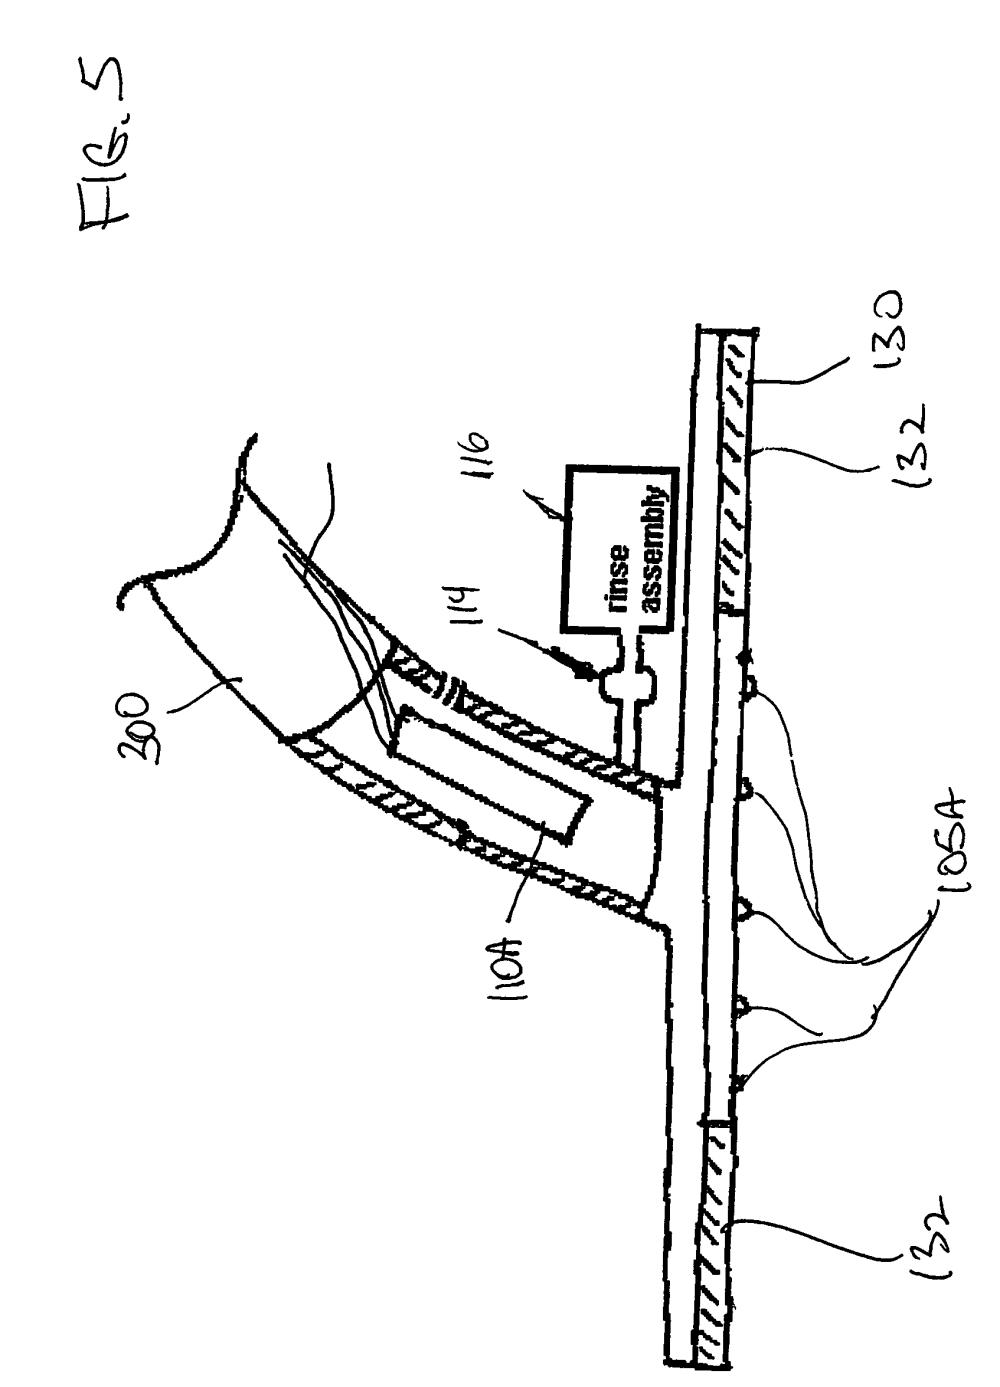 medium resolution of meyer truck lite wiring diagram 31 wiring diagram images basic wiring light meyer basic wiring light